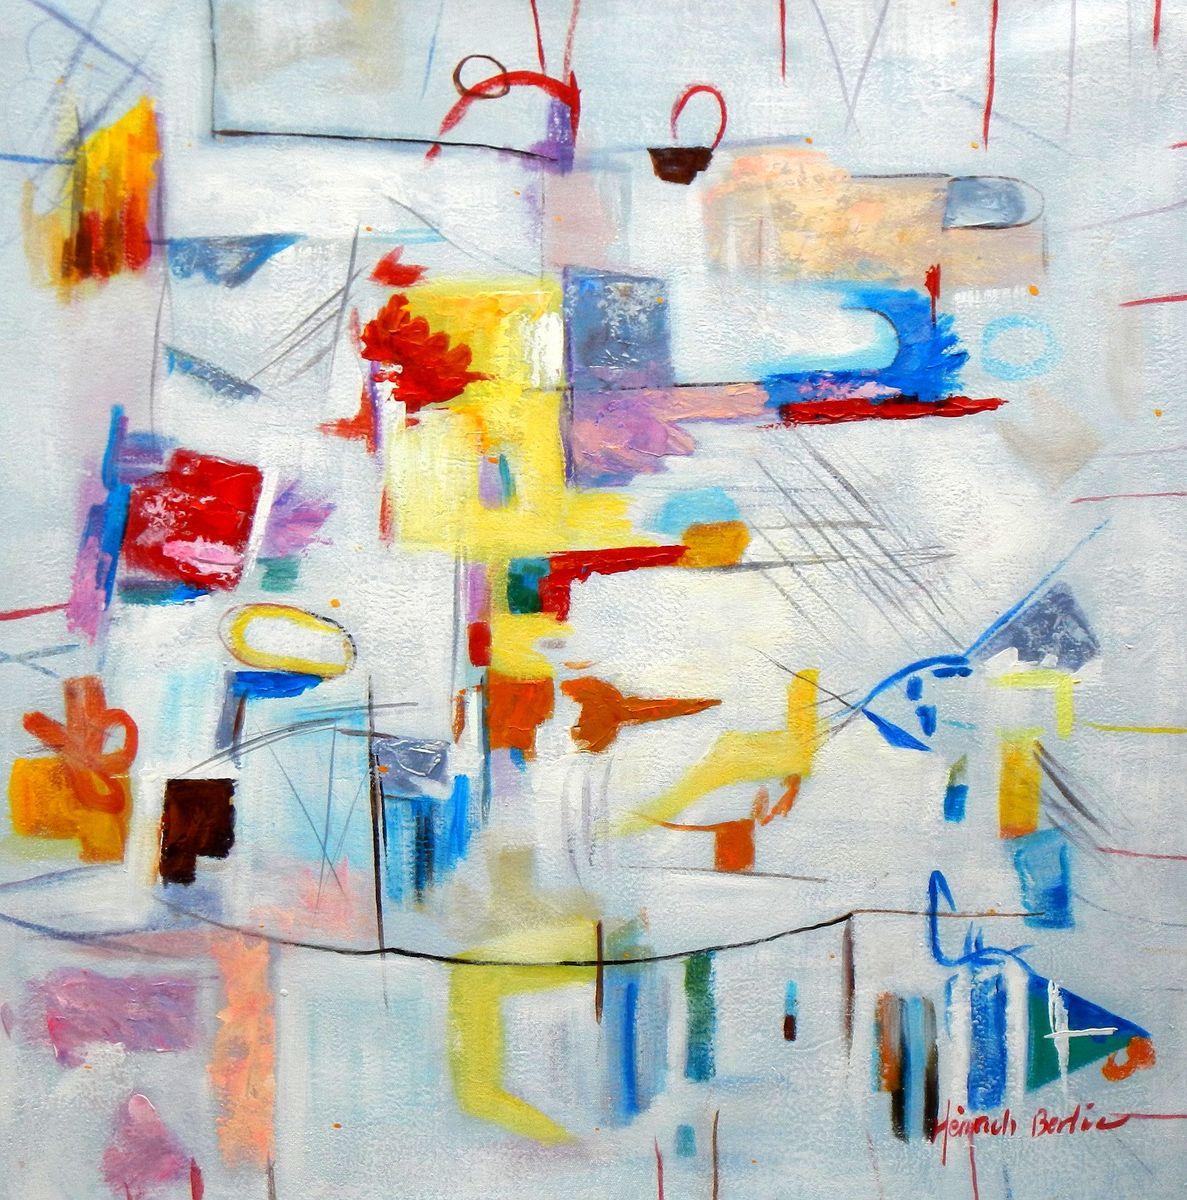 Abstract - Playground e96696 60x60cm abstraktes Gemälde handgemalt